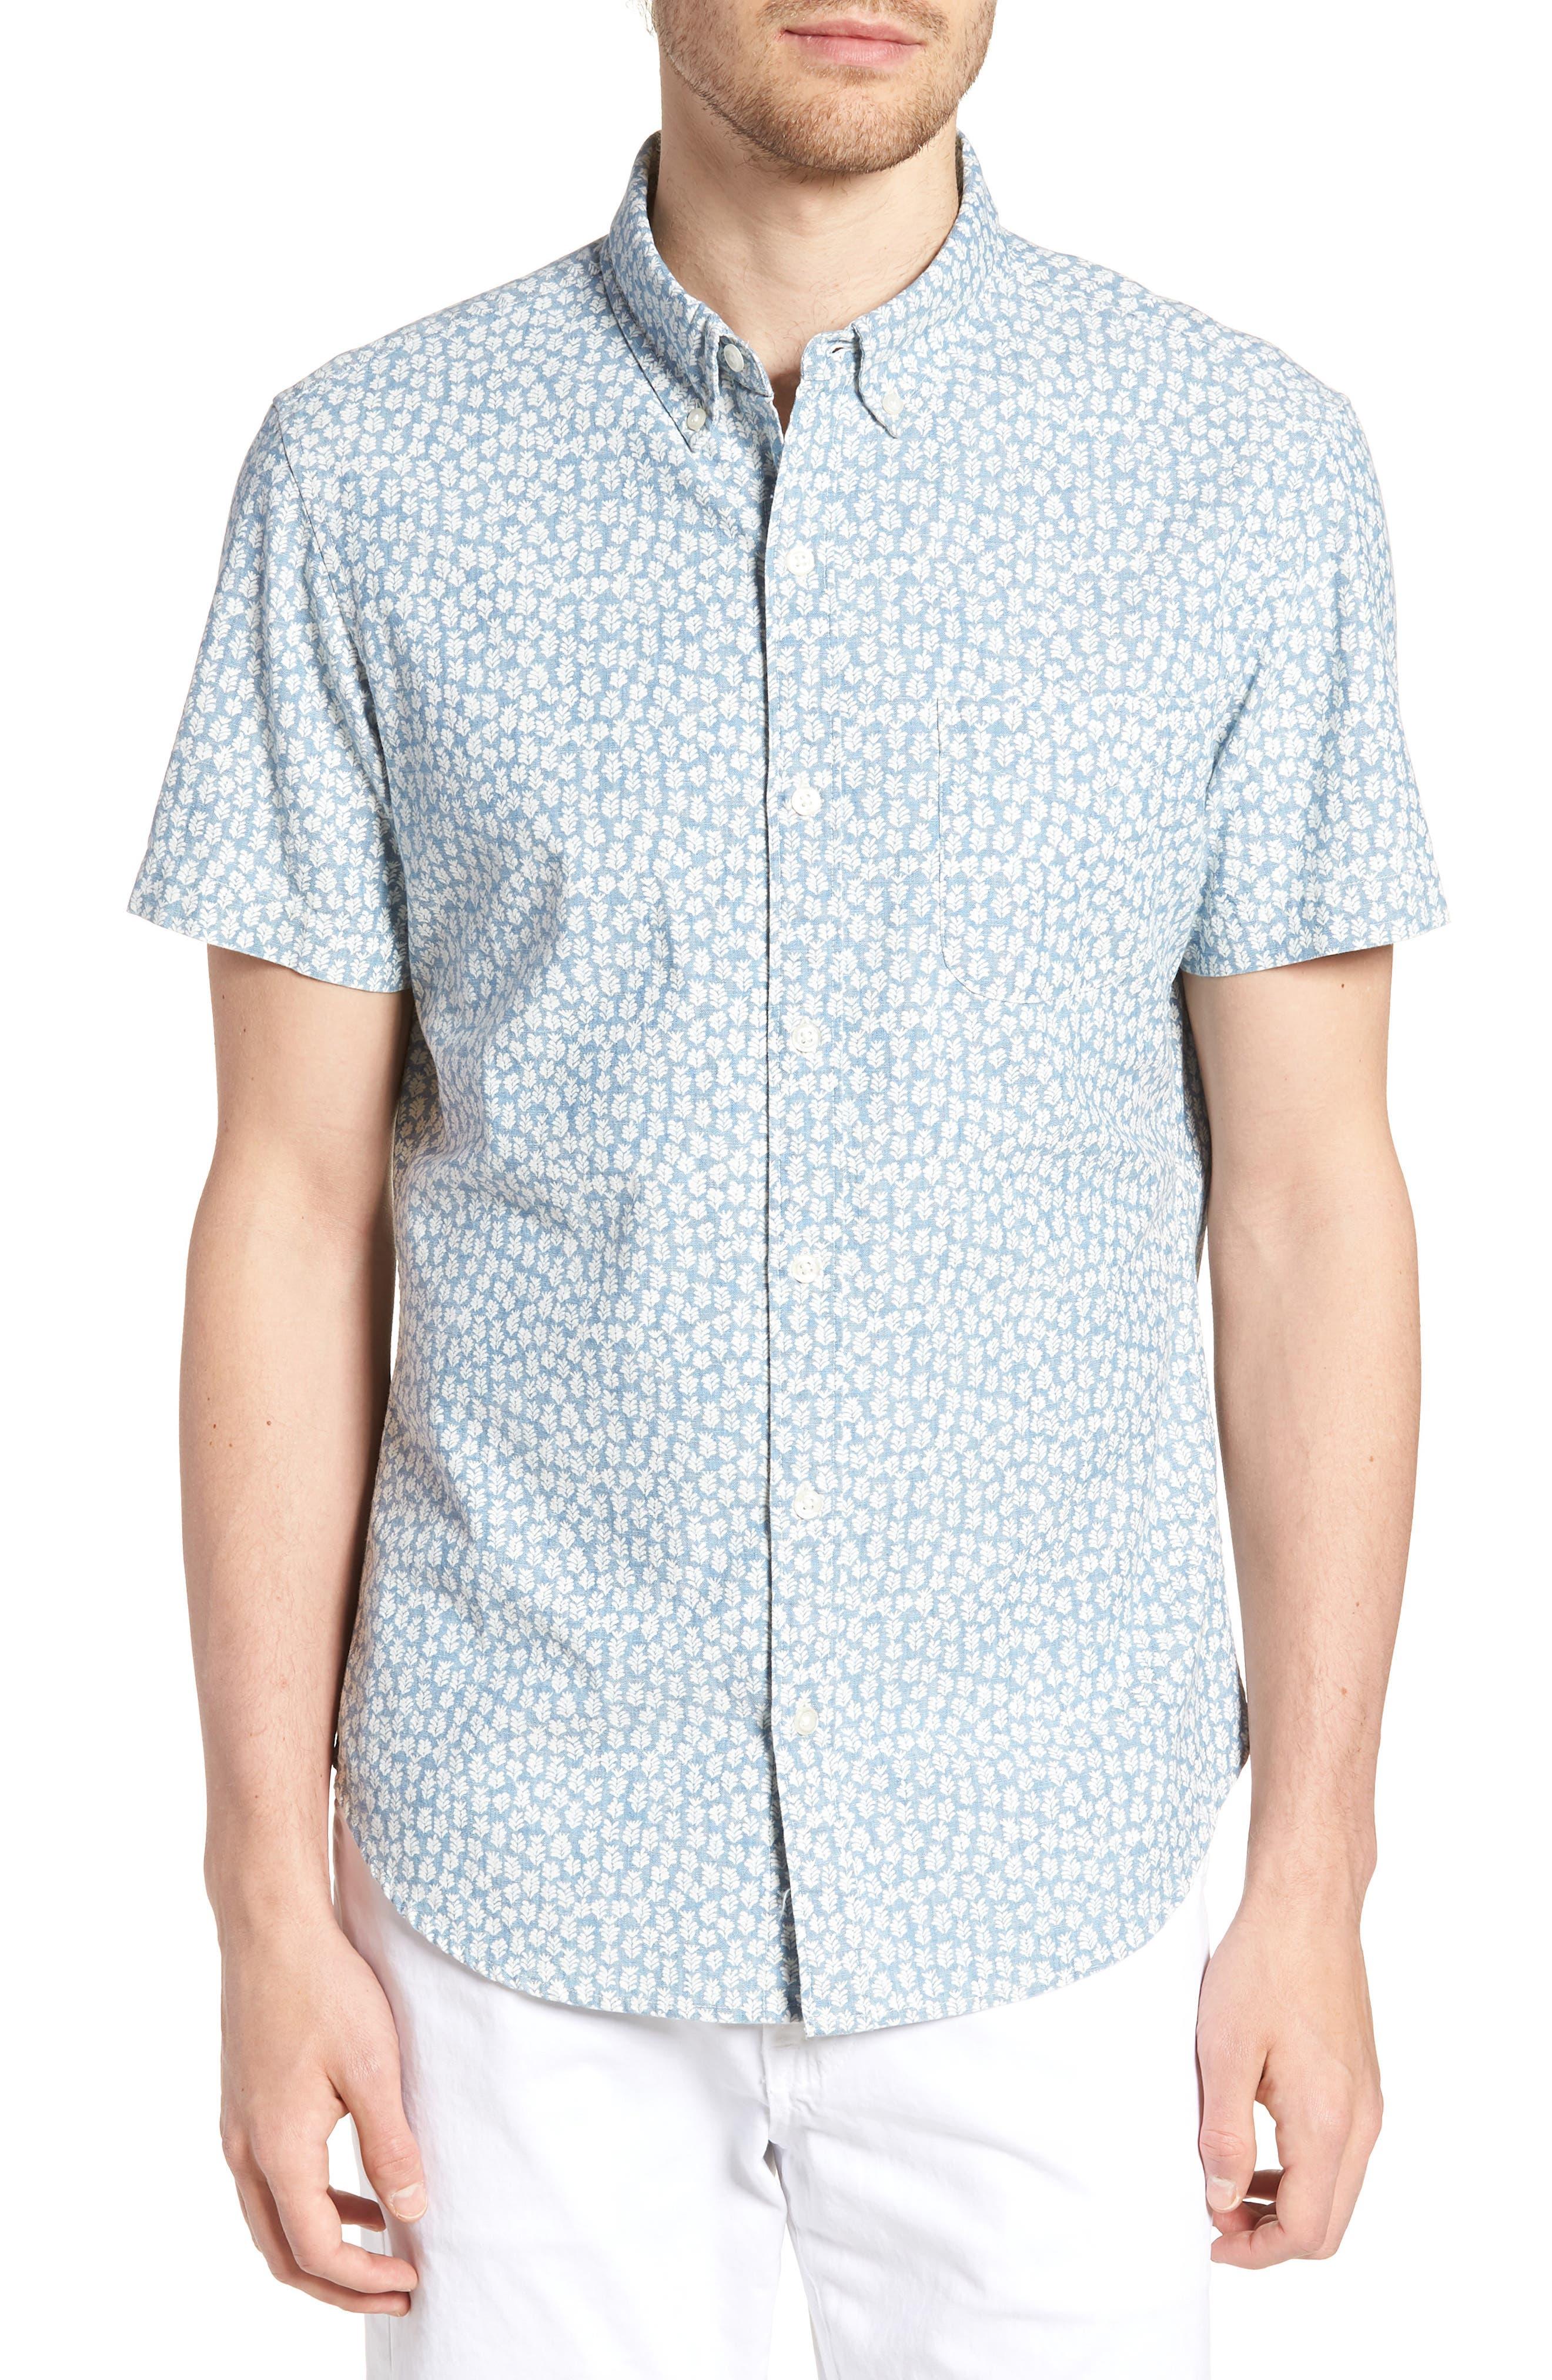 BONOBOS,                             Riviera Slim Fit Leaf Print Sport Shirt,                             Main thumbnail 1, color,                             400